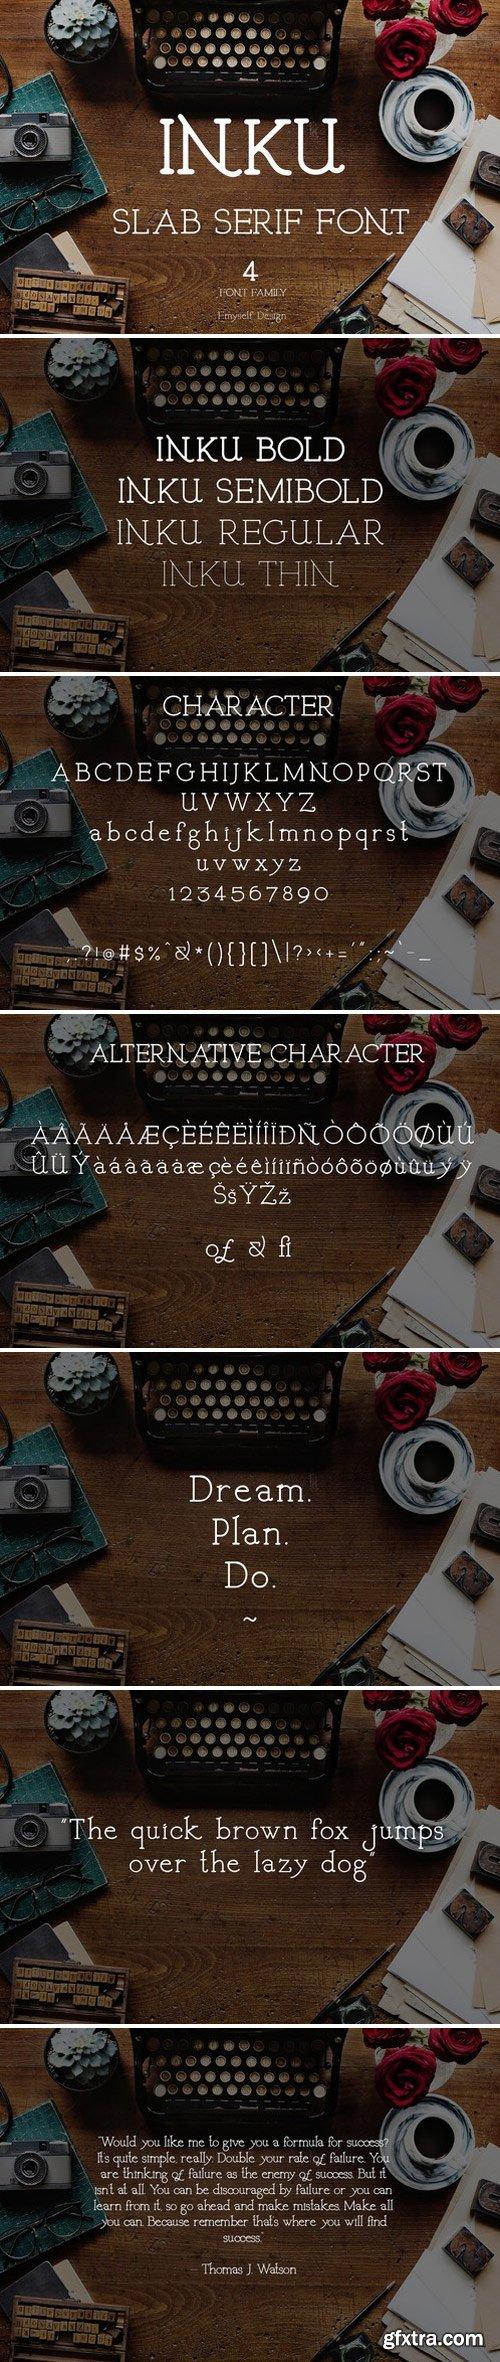 CM - Inku font ( 4 font family) 2458123